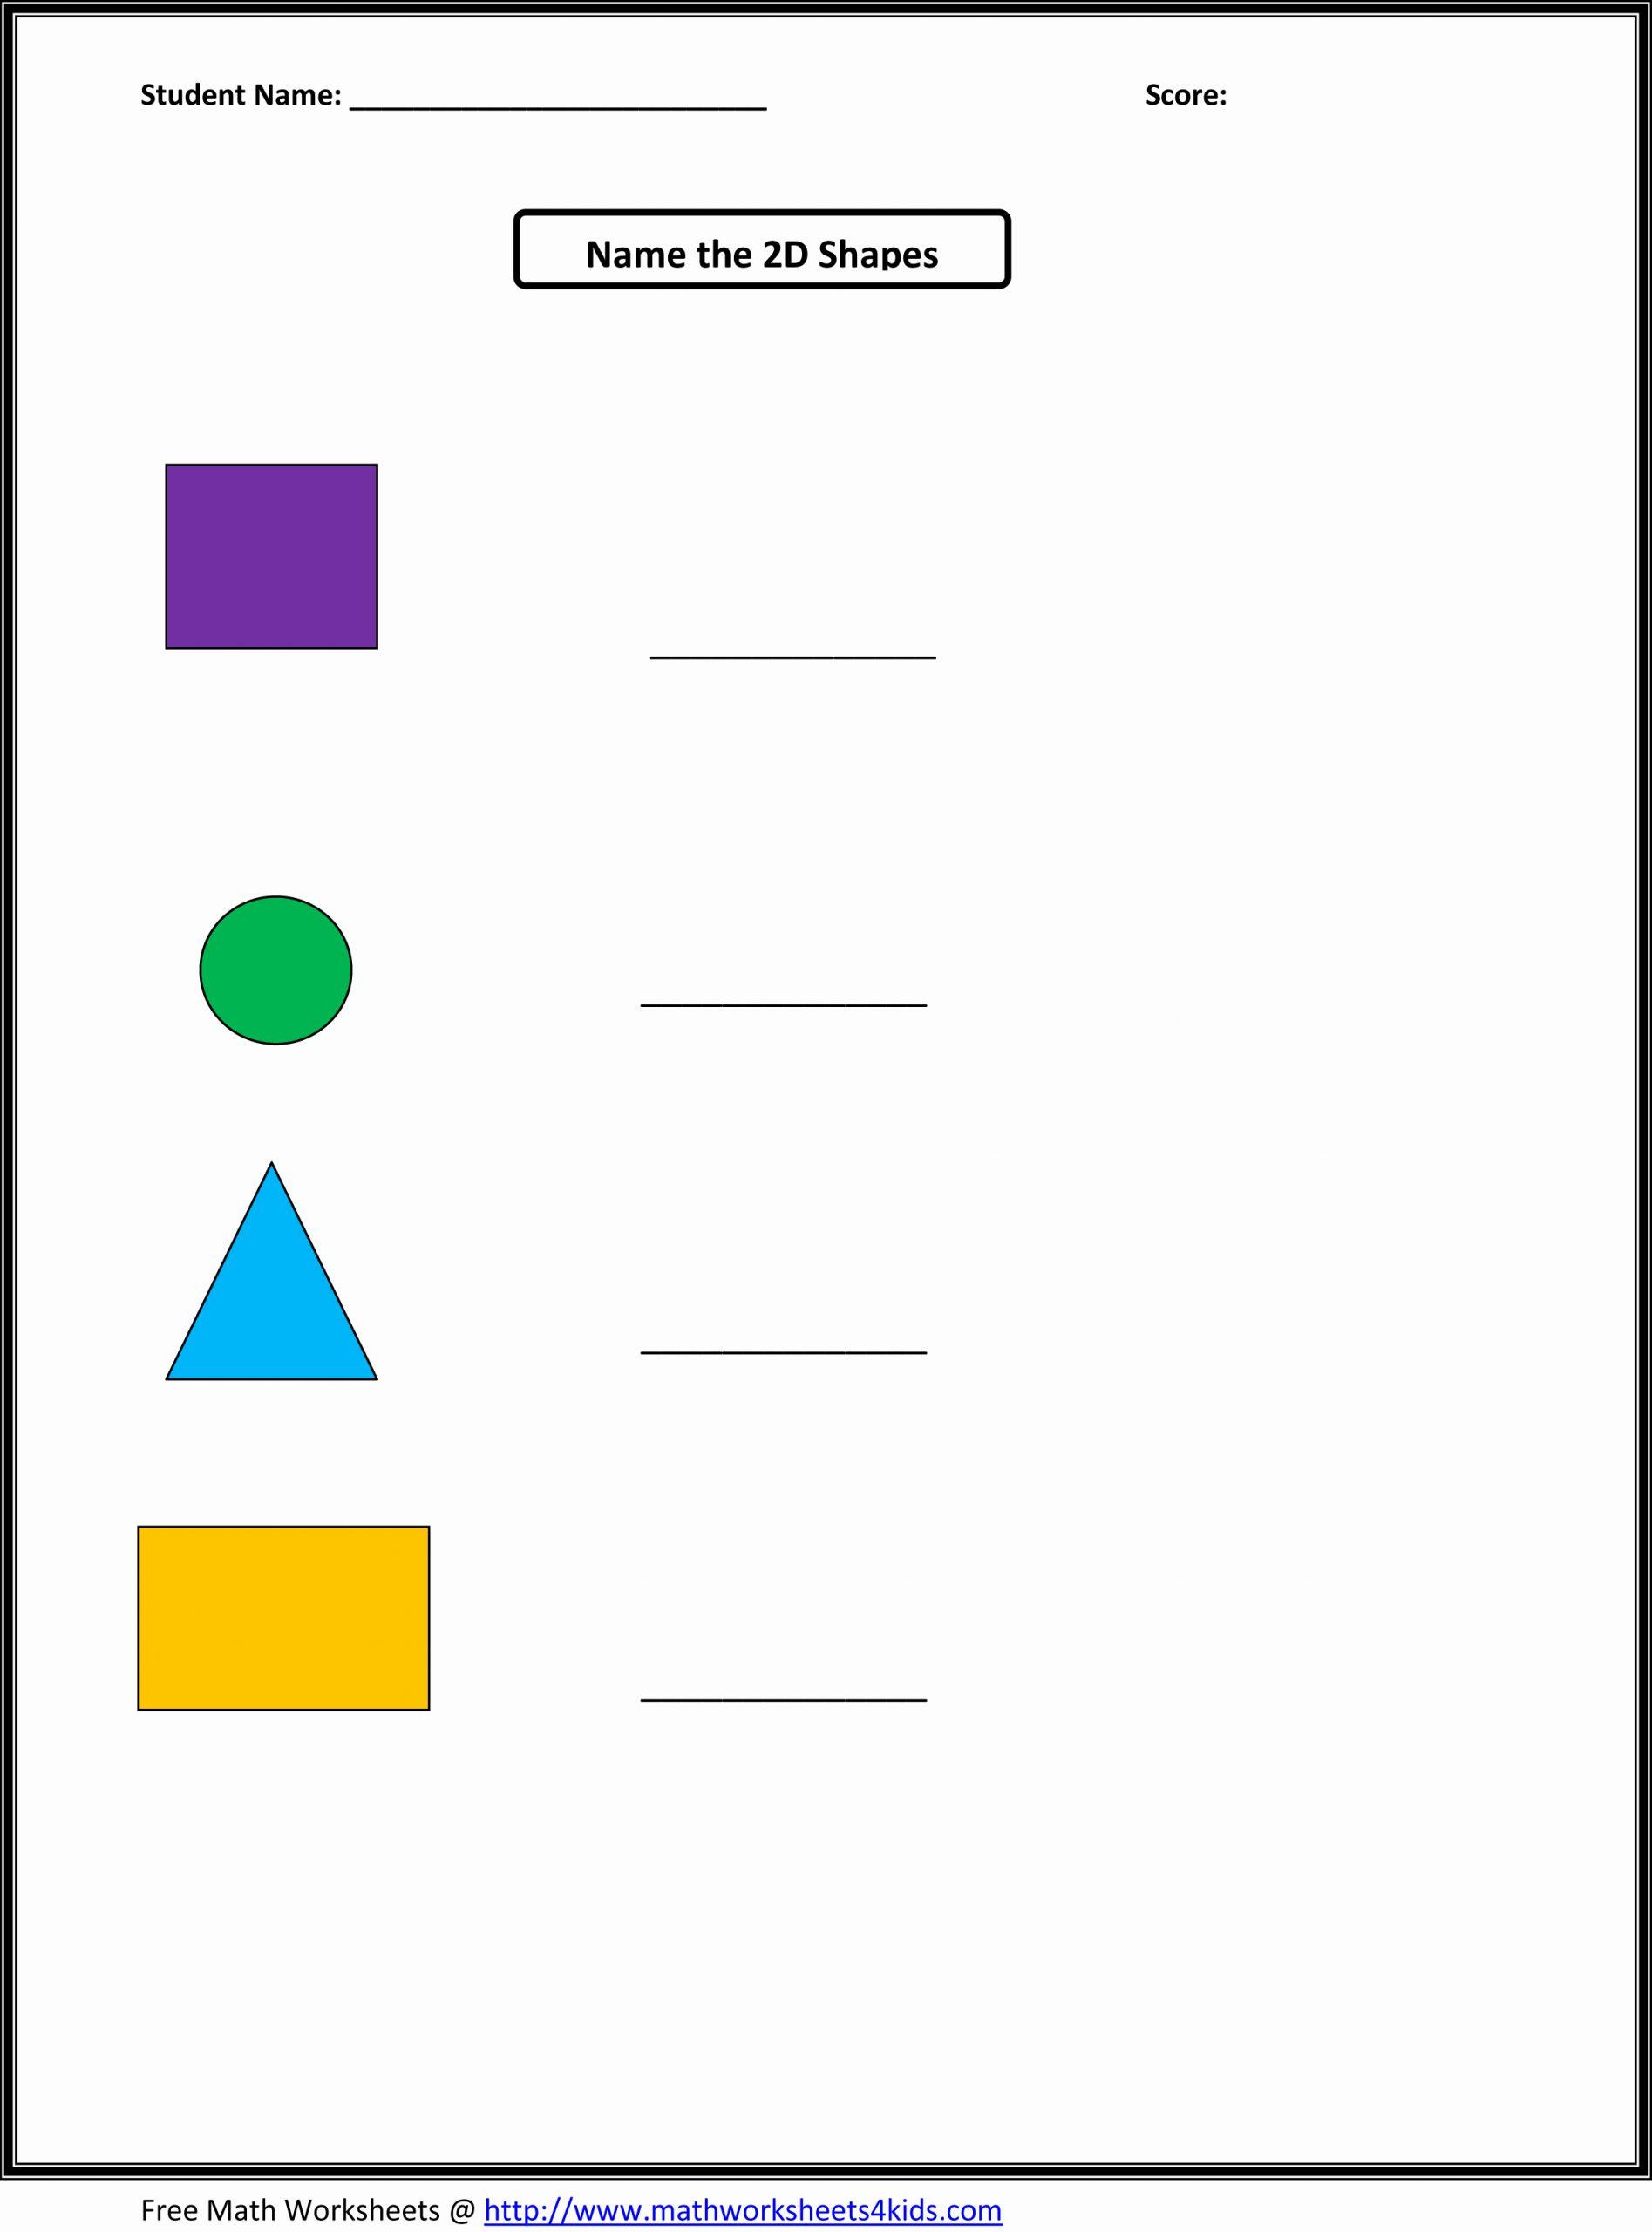 2d Shapes Worksheets Kindergarten Awesome Nbs Preschool